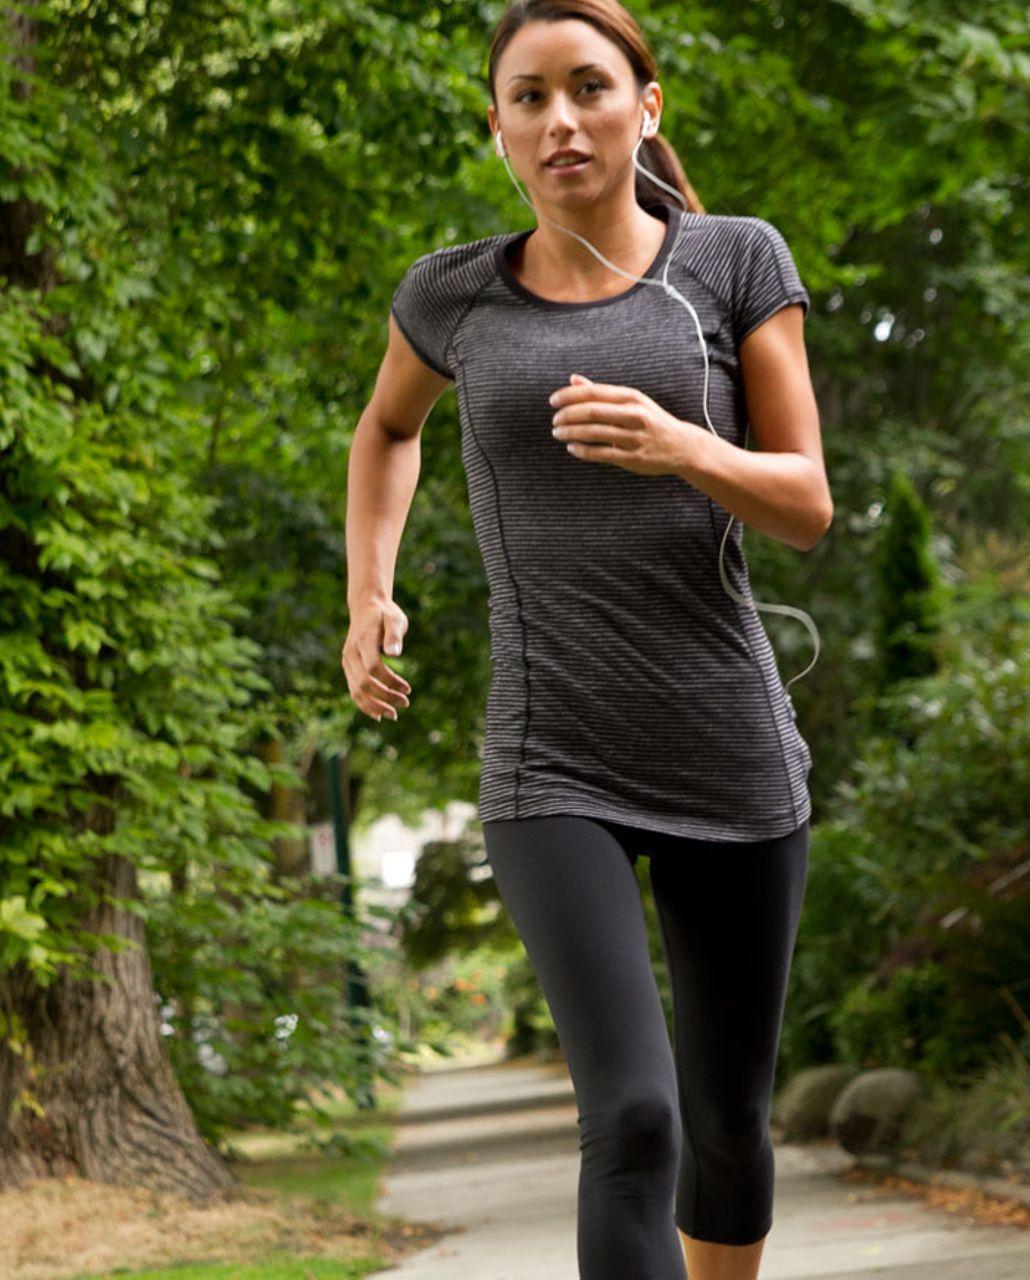 Lululemon Run:  Turn Around Short Sleeve - Black Heathered Coal Mini Check /  Reflective Sparkle Splatter